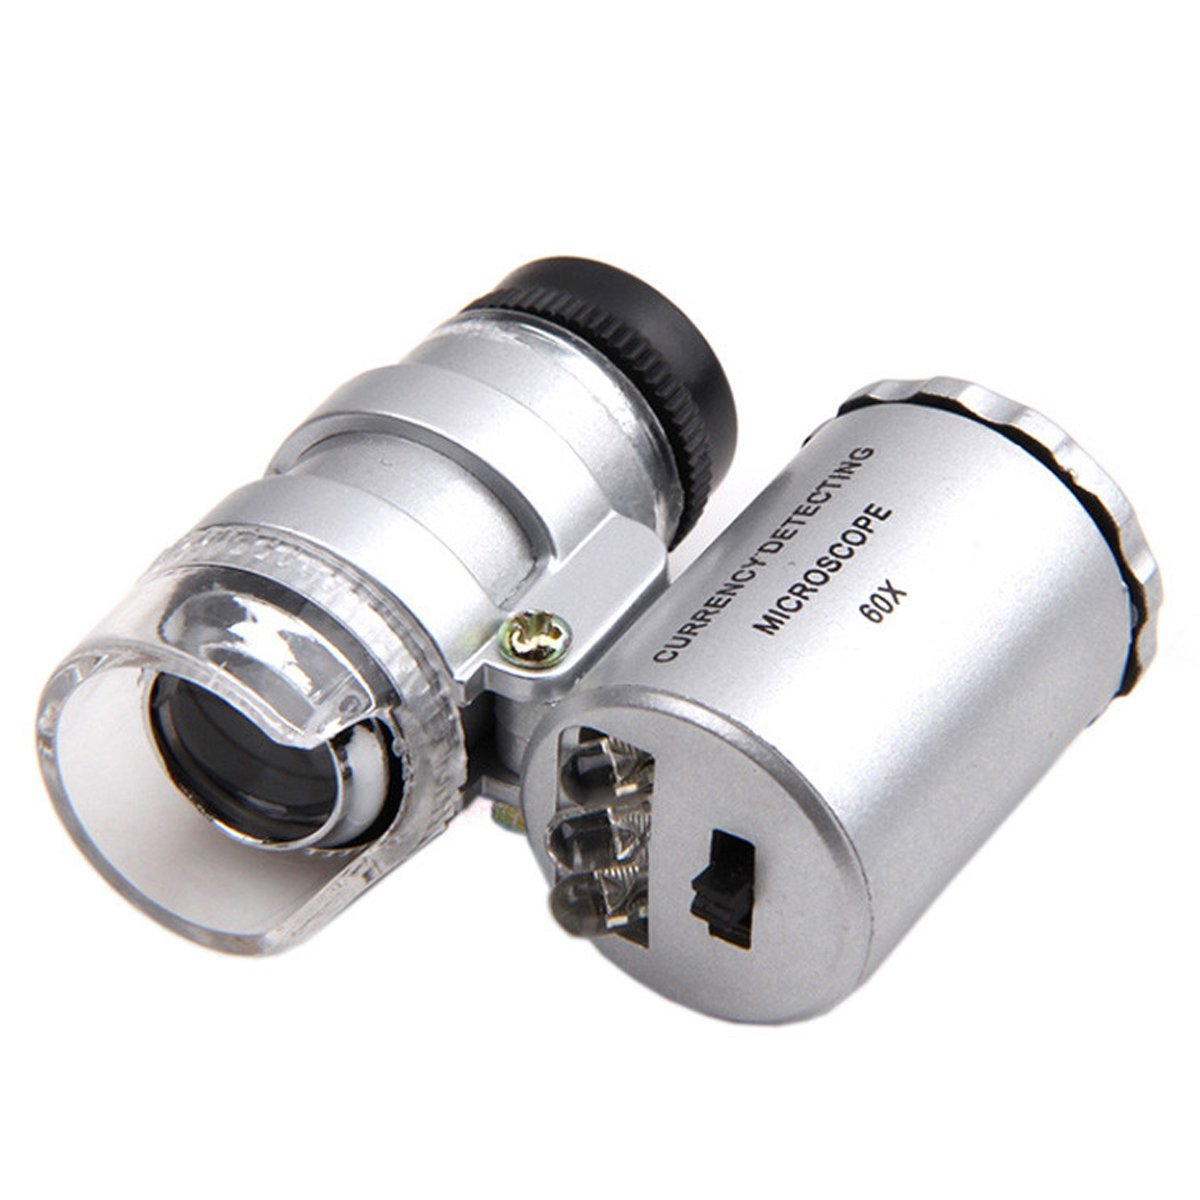 Kingmas Mini 60x Microscope Magnifying With Led Uv Light